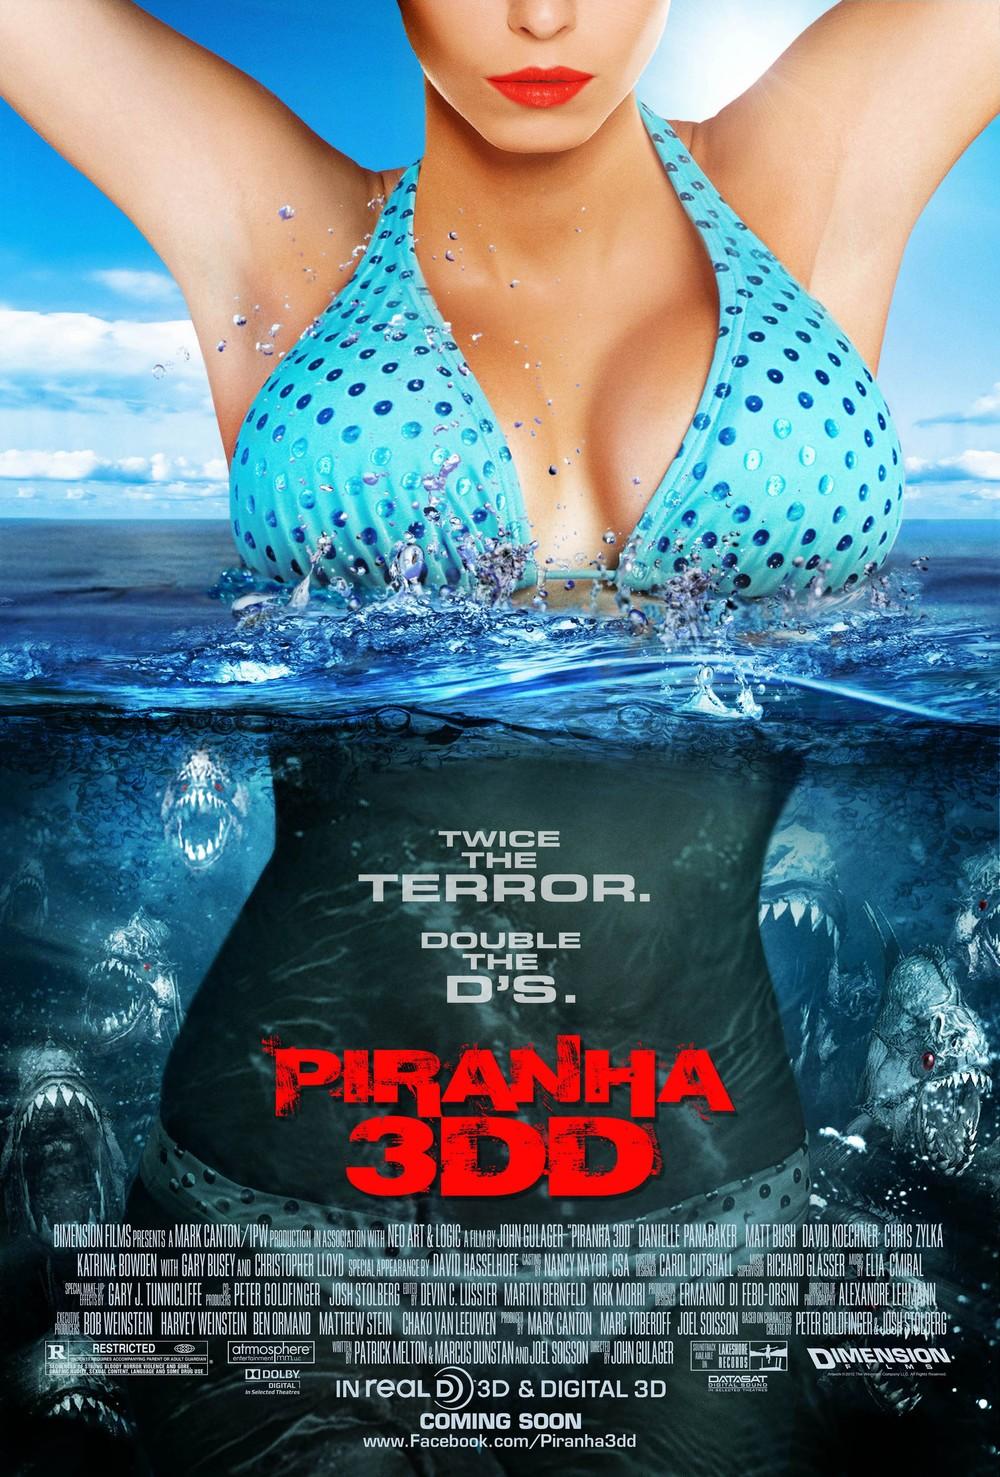 Piranha-3DD-Poster-004.jpg